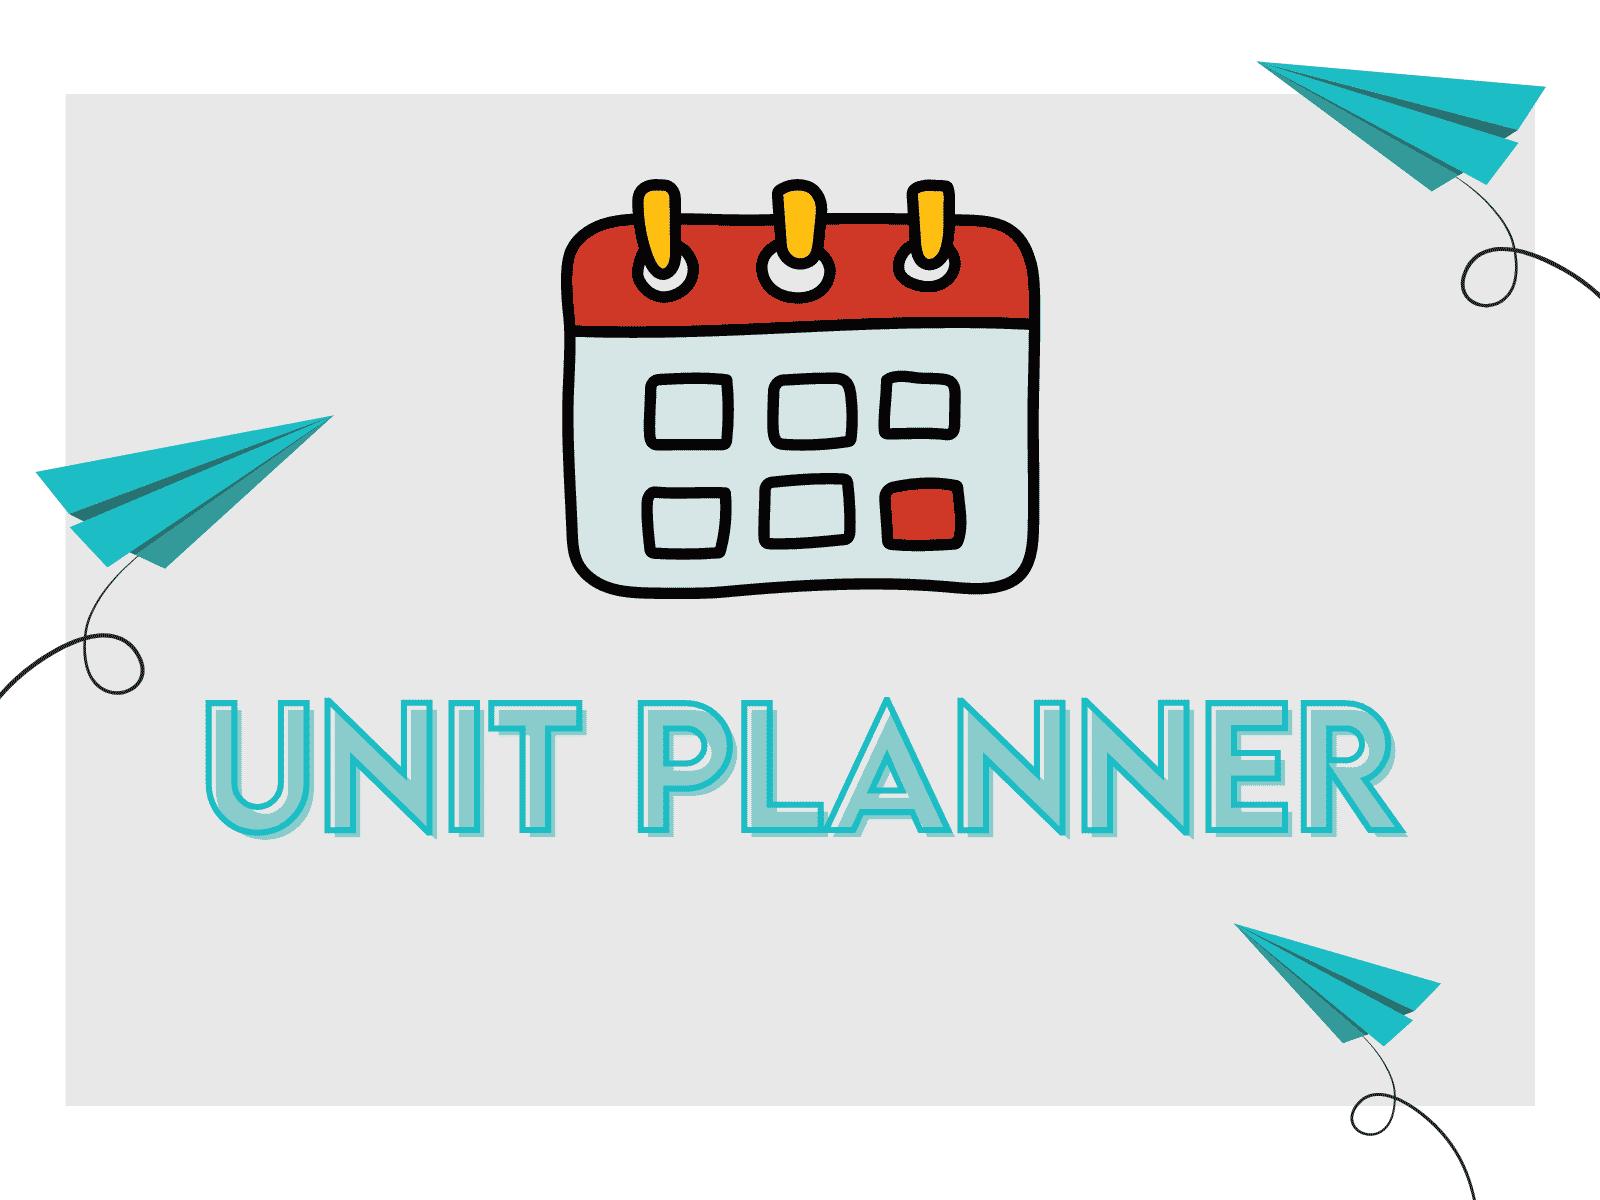 Free downloadable unit planner for teachers.